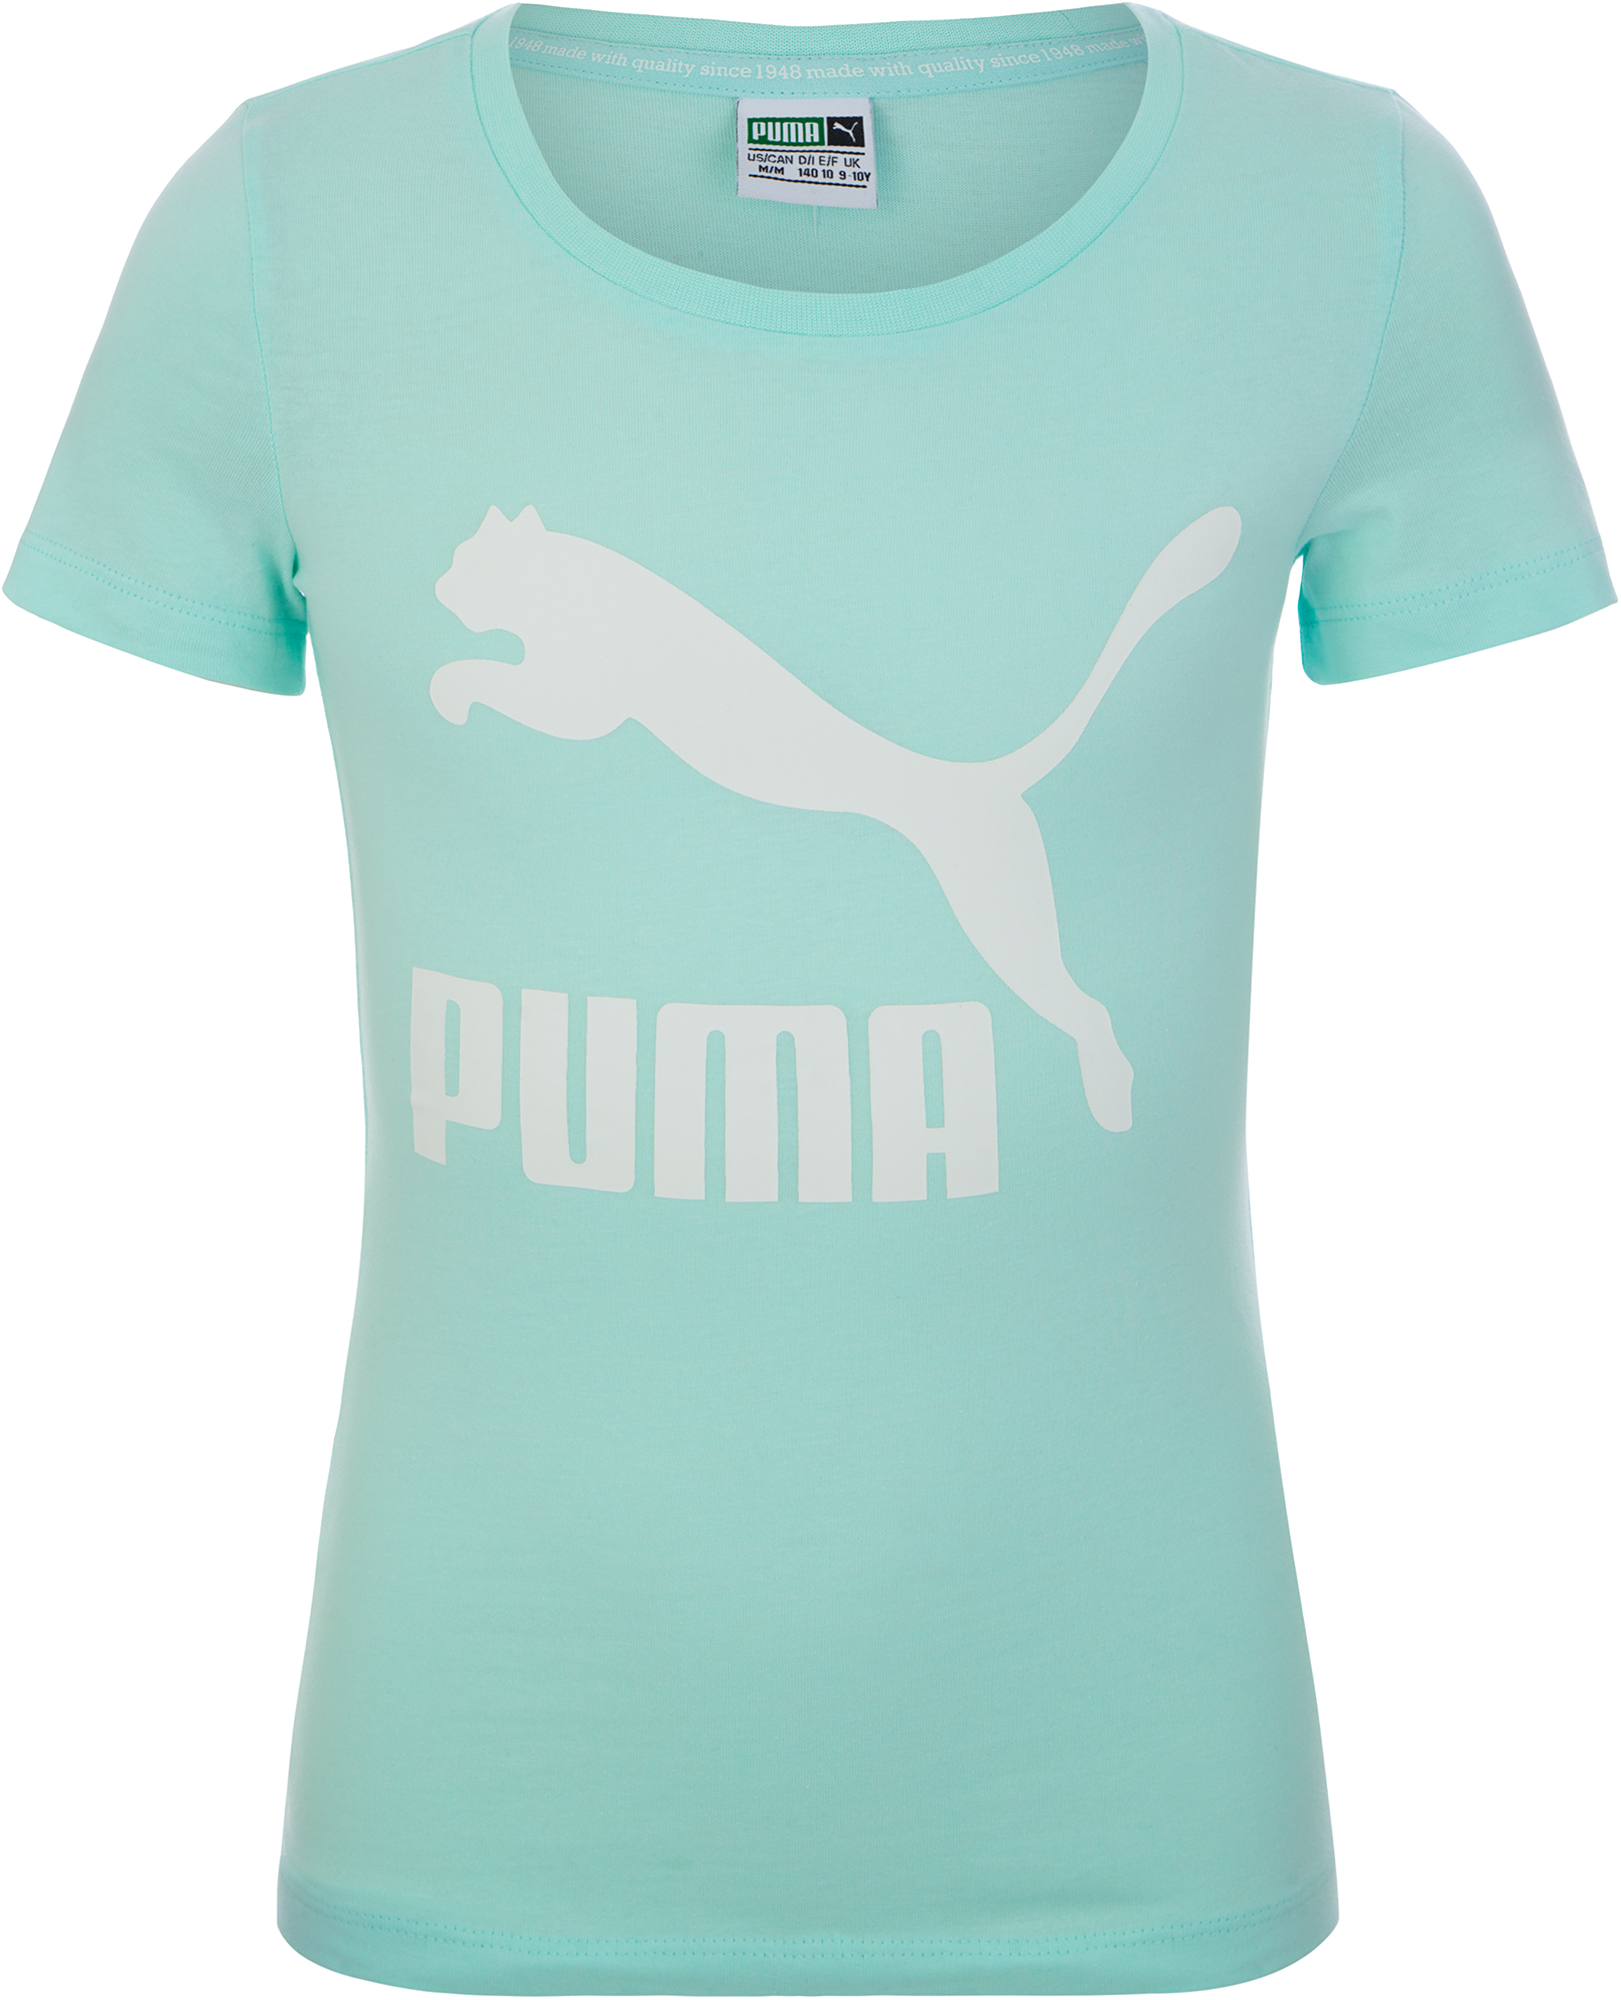 Puma Футболка для девочек Puma Classics Logo Tee, размер 164